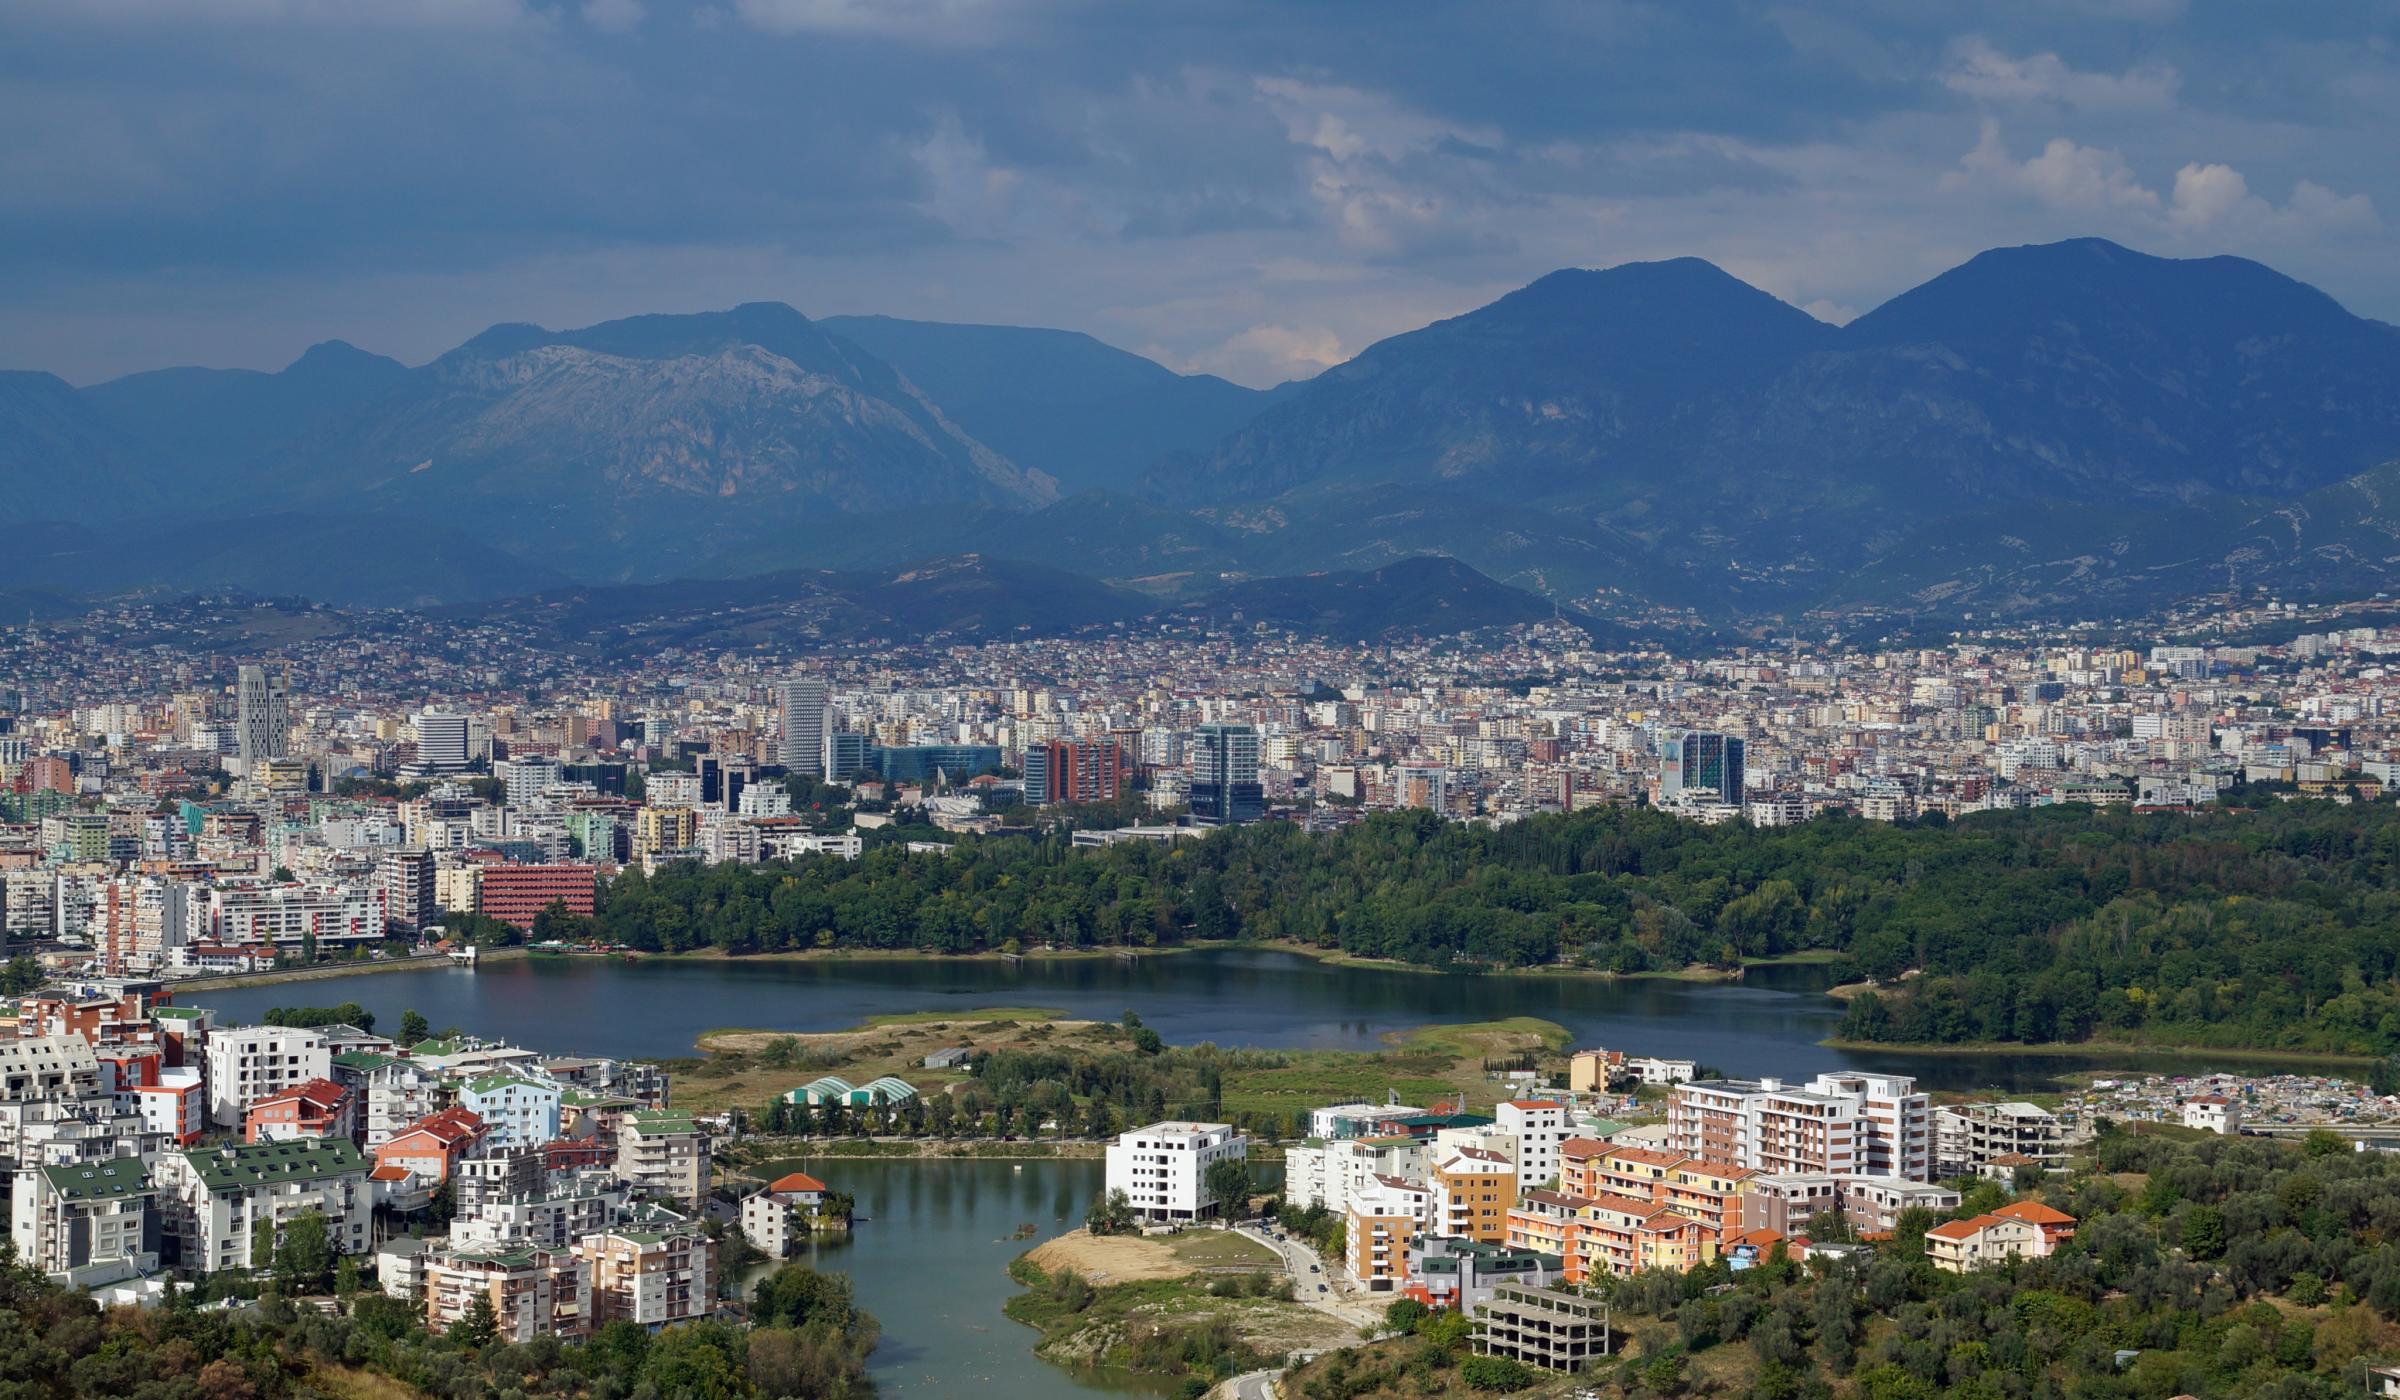 003 Tourism In Albania Essay U8grdi6c5922f706a99a0 2400 1400 C 75 Unbelievable Full